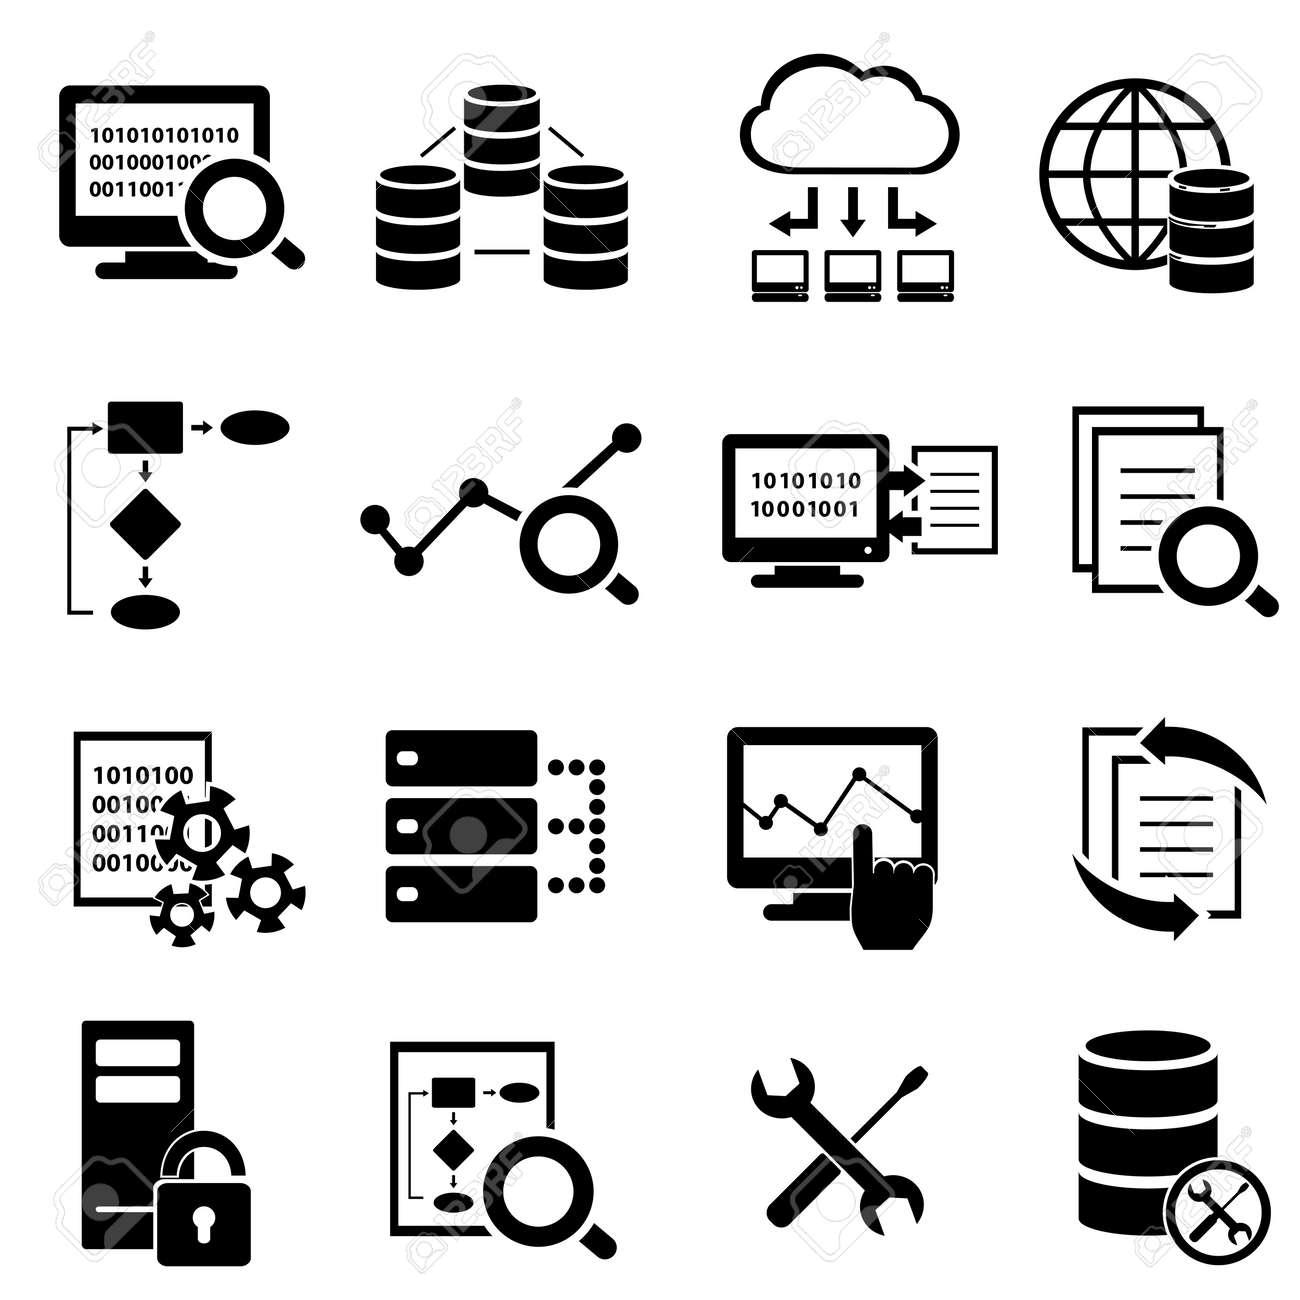 Big data, cloud computing and technology icon set - 30768352